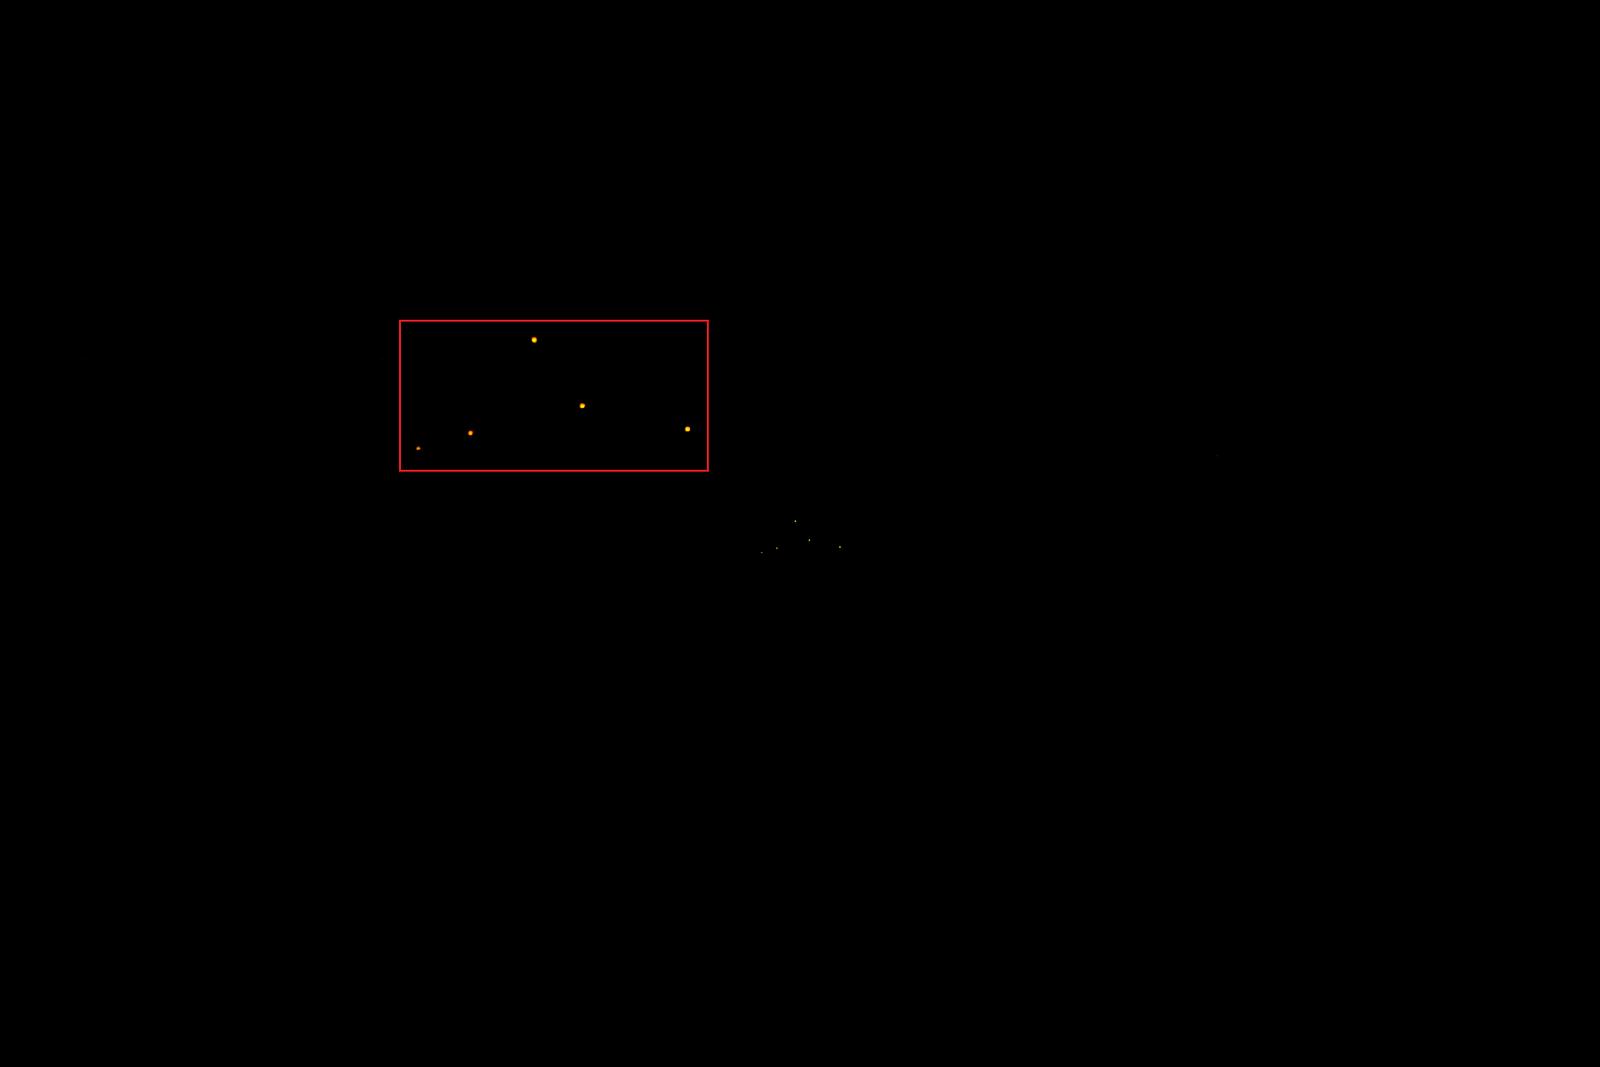 ufo triangle